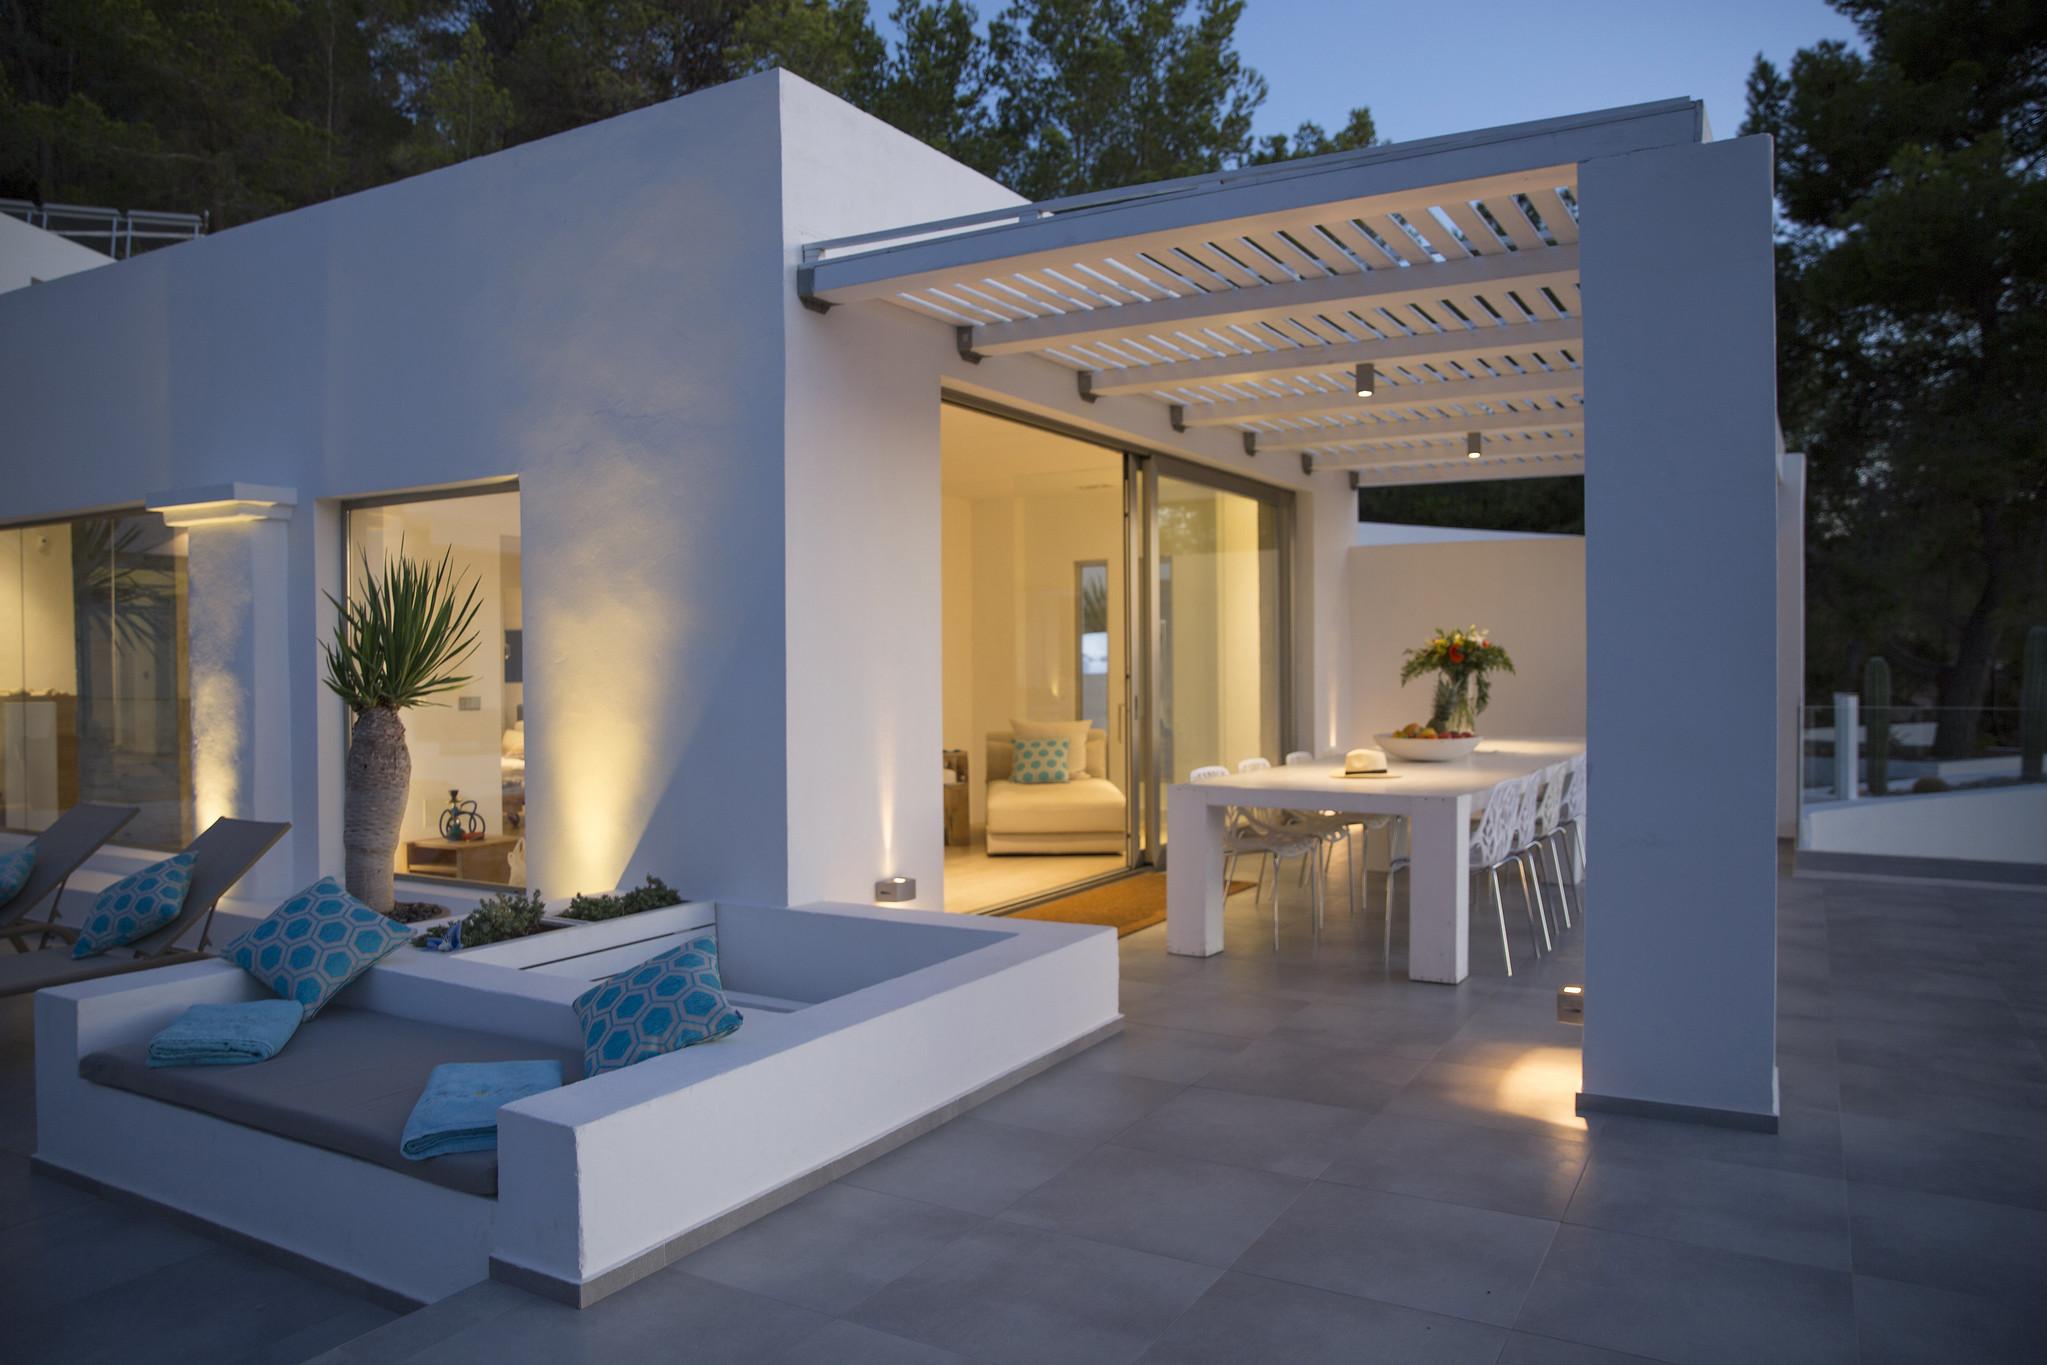 https://www.white-ibiza.com/wp-content/uploads/2020/05/white-ibiza-villas-can-dela-evening-terrace.jpg